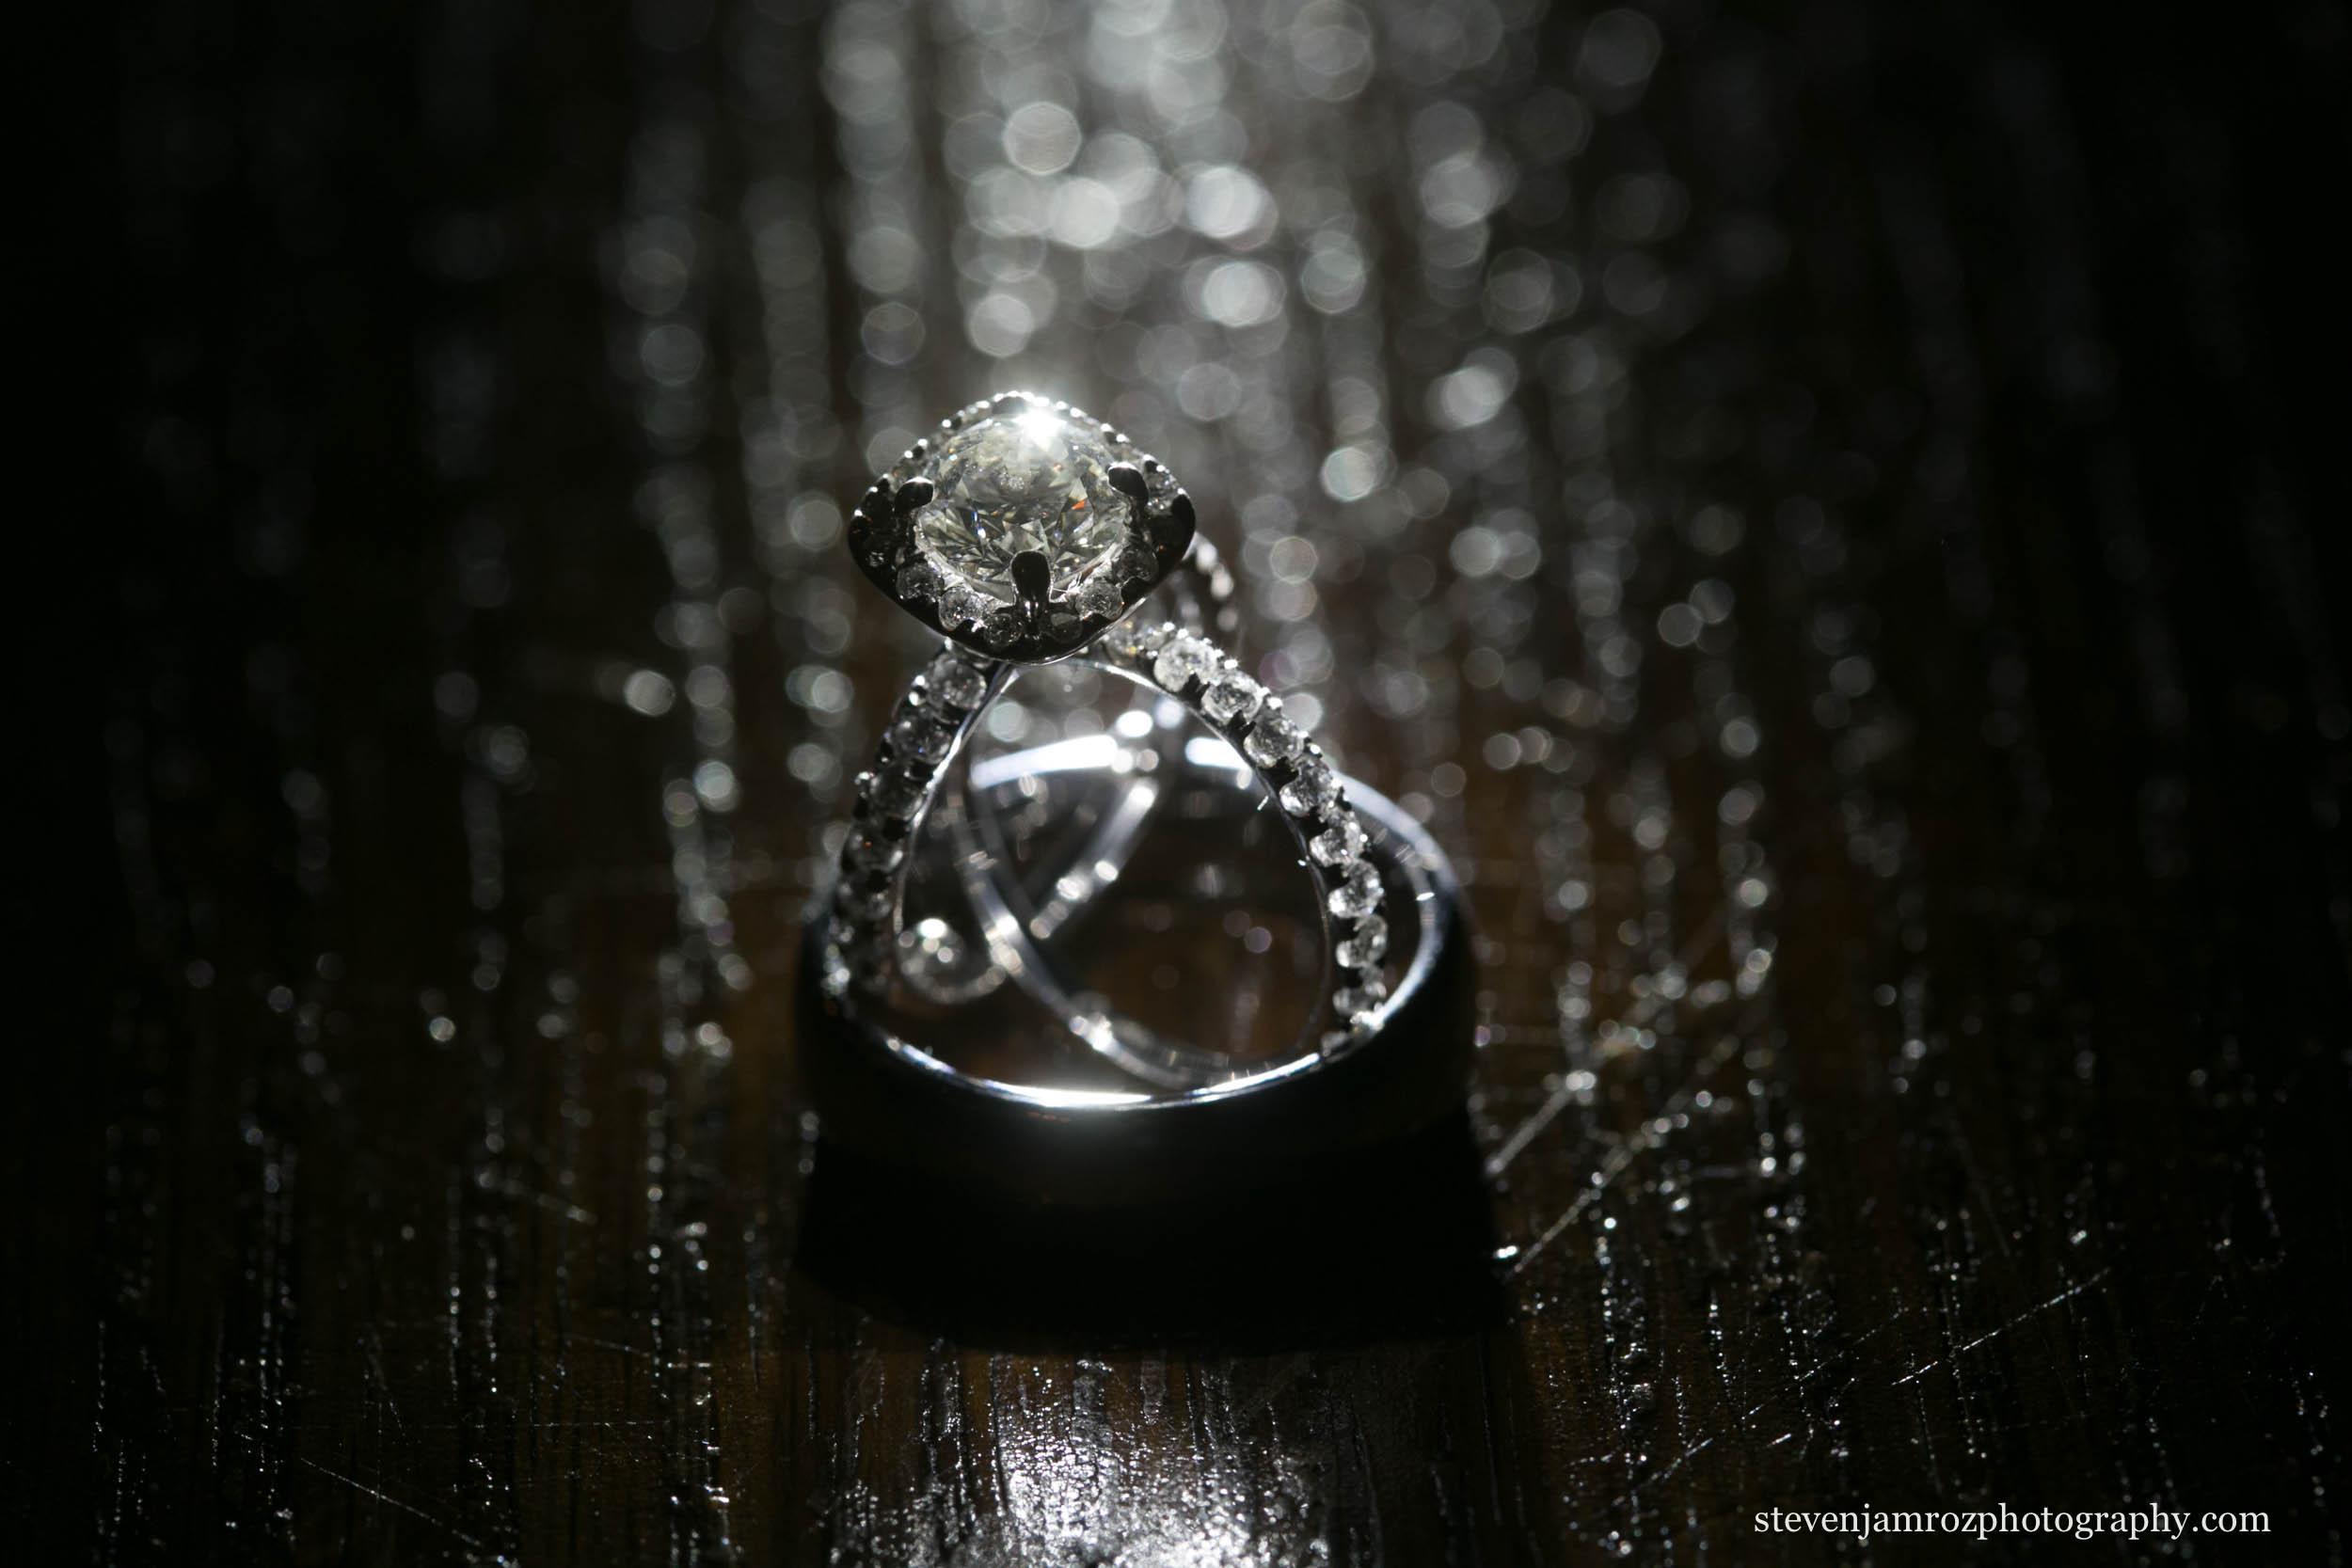 wedding-rings-closeup-steven-jamroz-photography-0574.jpg